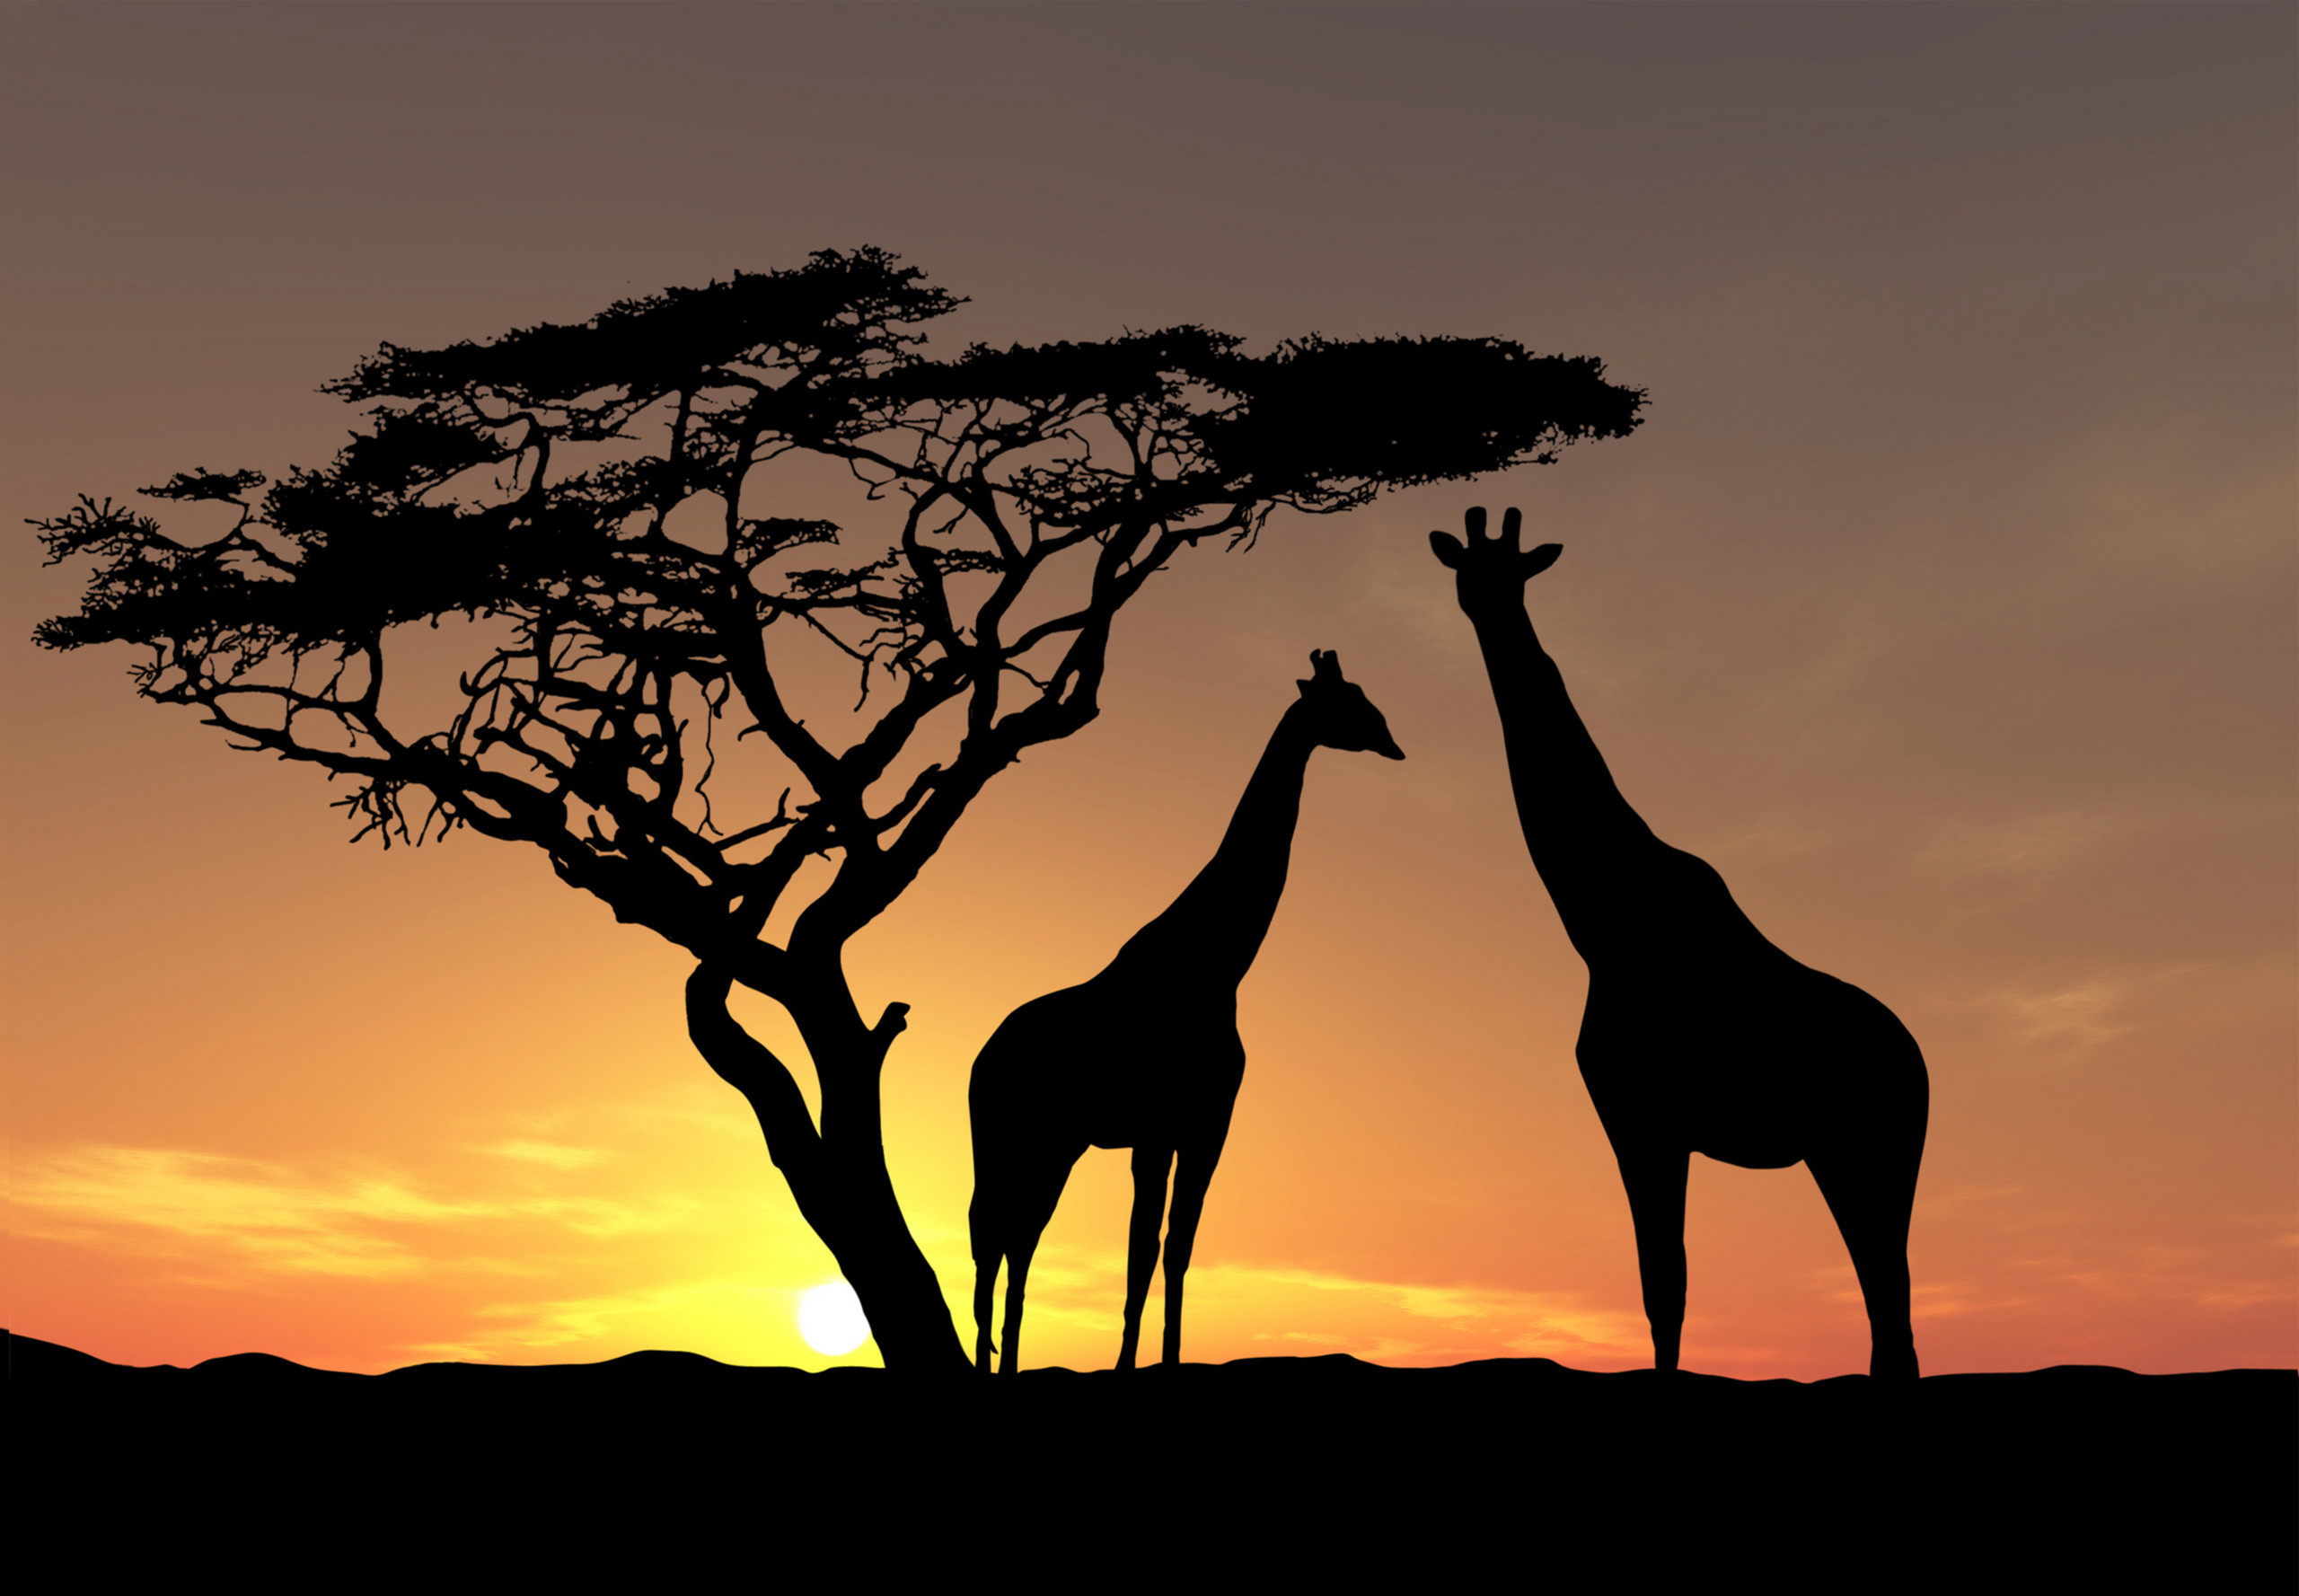 giraffe sunset giraffe sunset giraffe sunset giraffe sunset giraffe sunset  wallpaper …